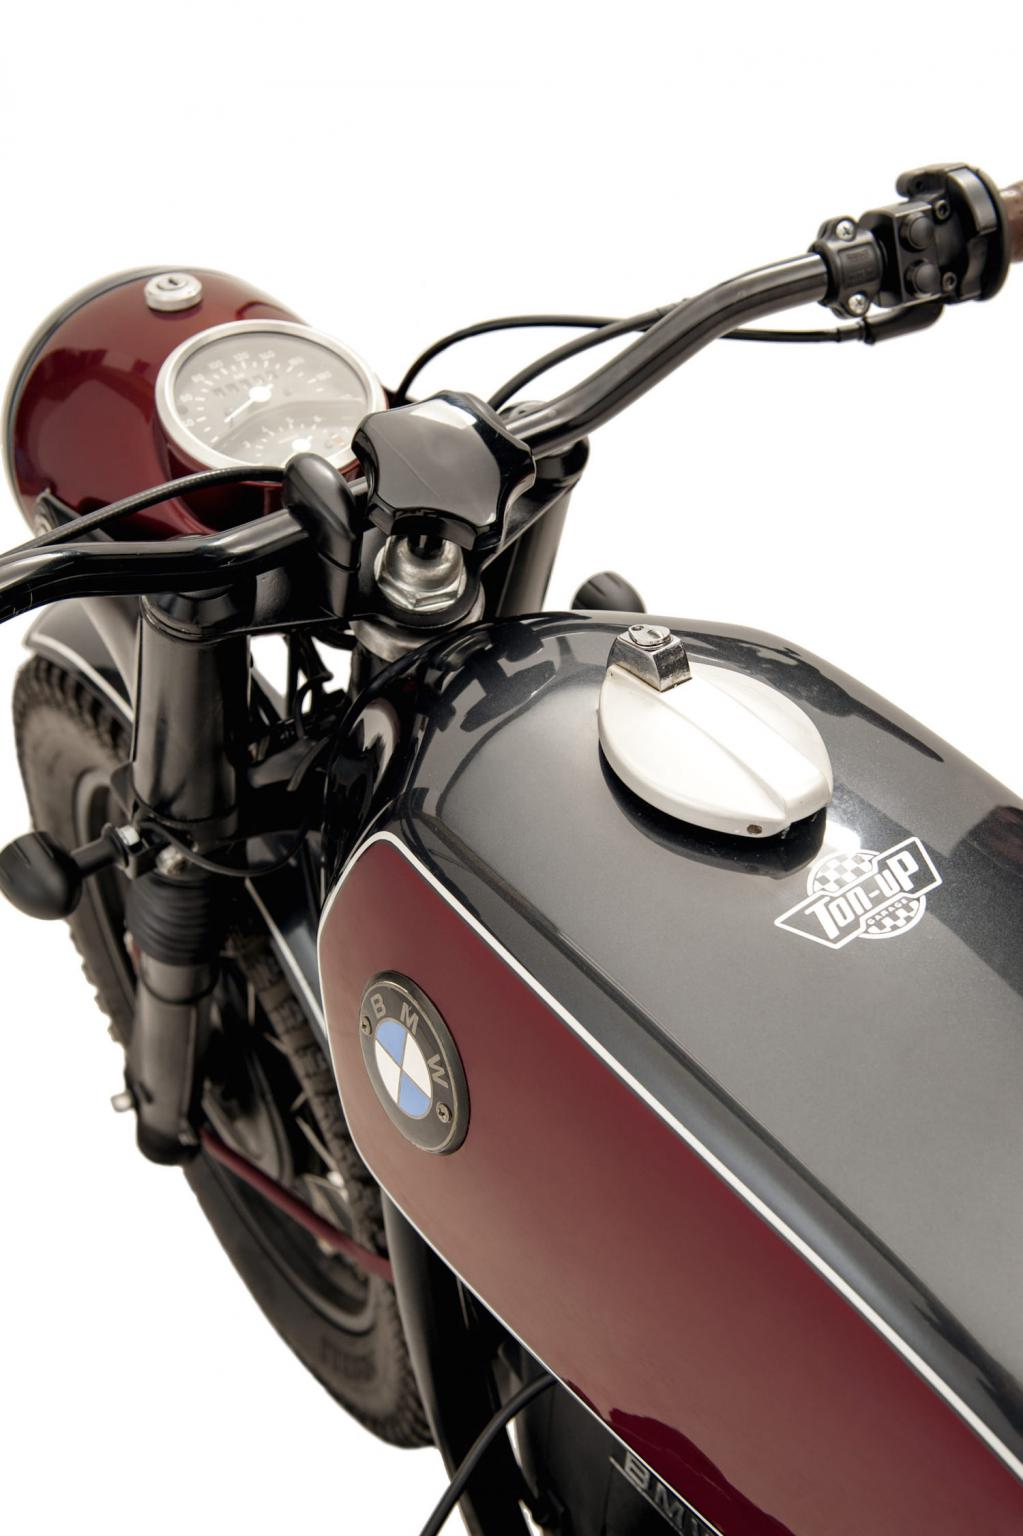 bmw r75 5 by ton up garage motorrad fotos motorrad bilder. Black Bedroom Furniture Sets. Home Design Ideas